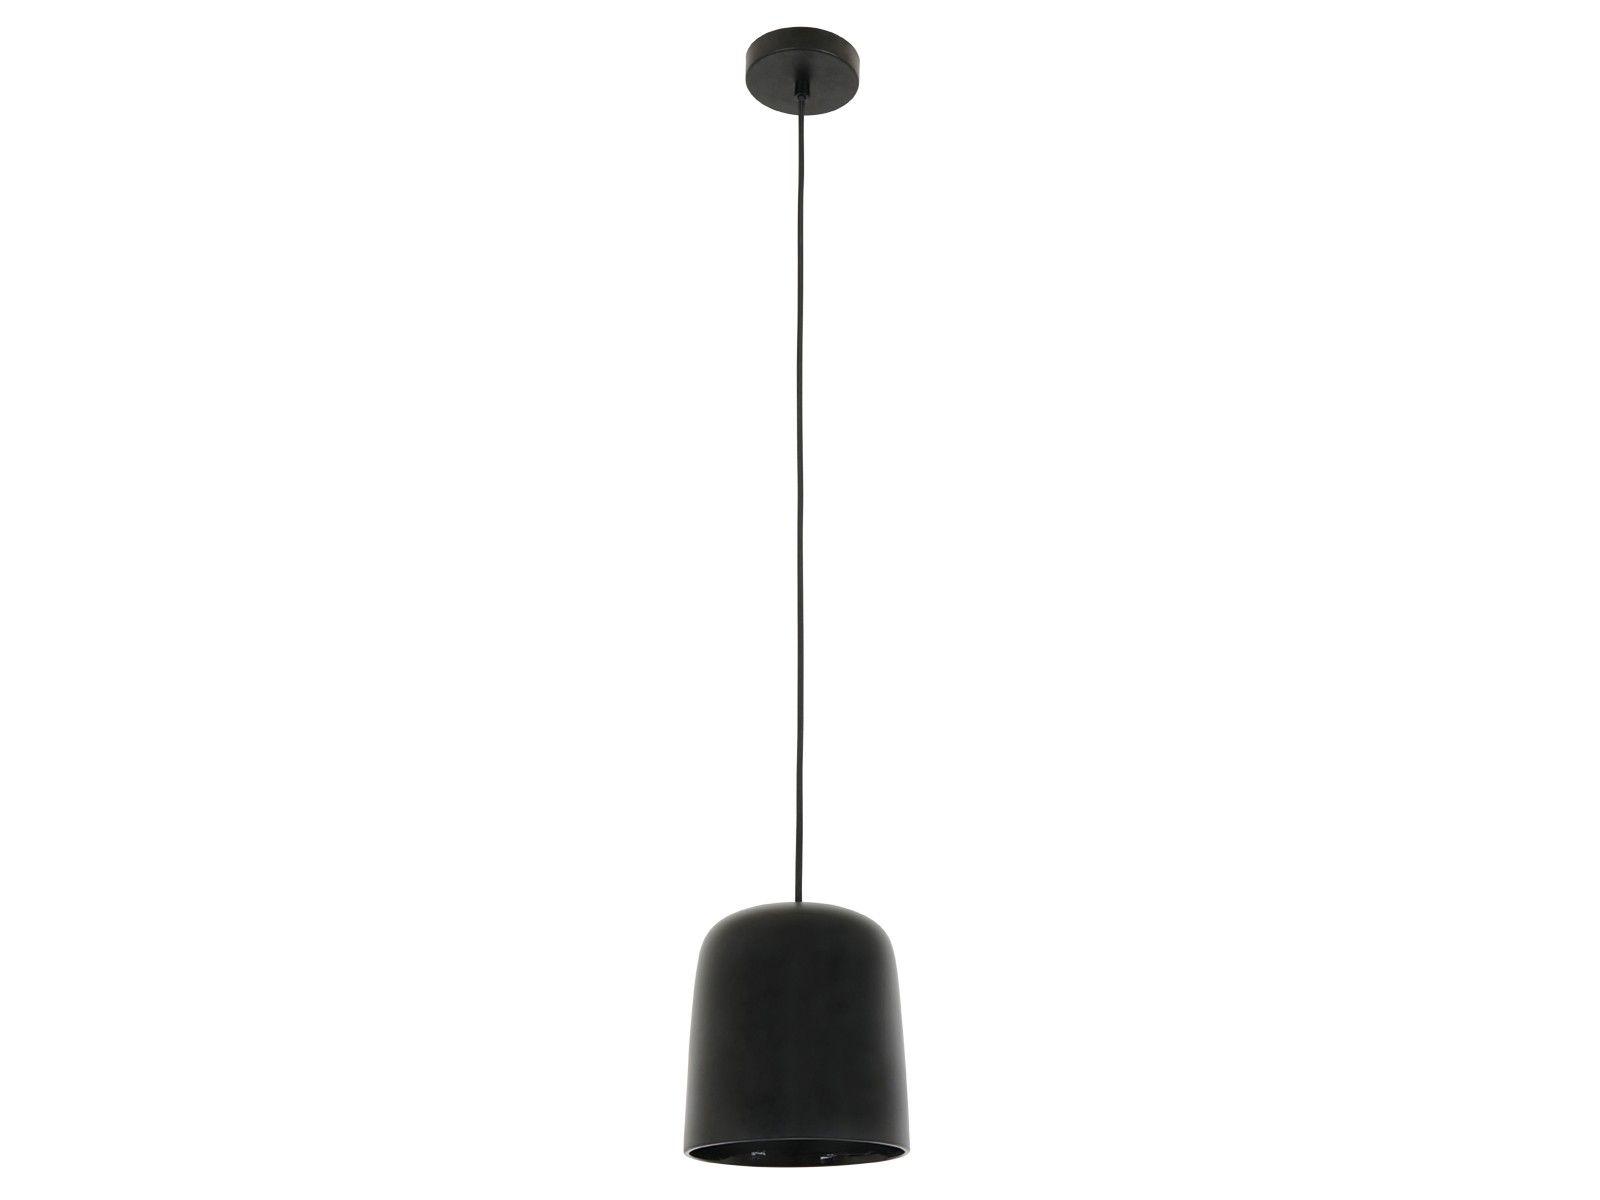 Clayton ceramic pendant in black beacon lighting kichen clayton ceramic pendant in black beacon lighting aloadofball Image collections